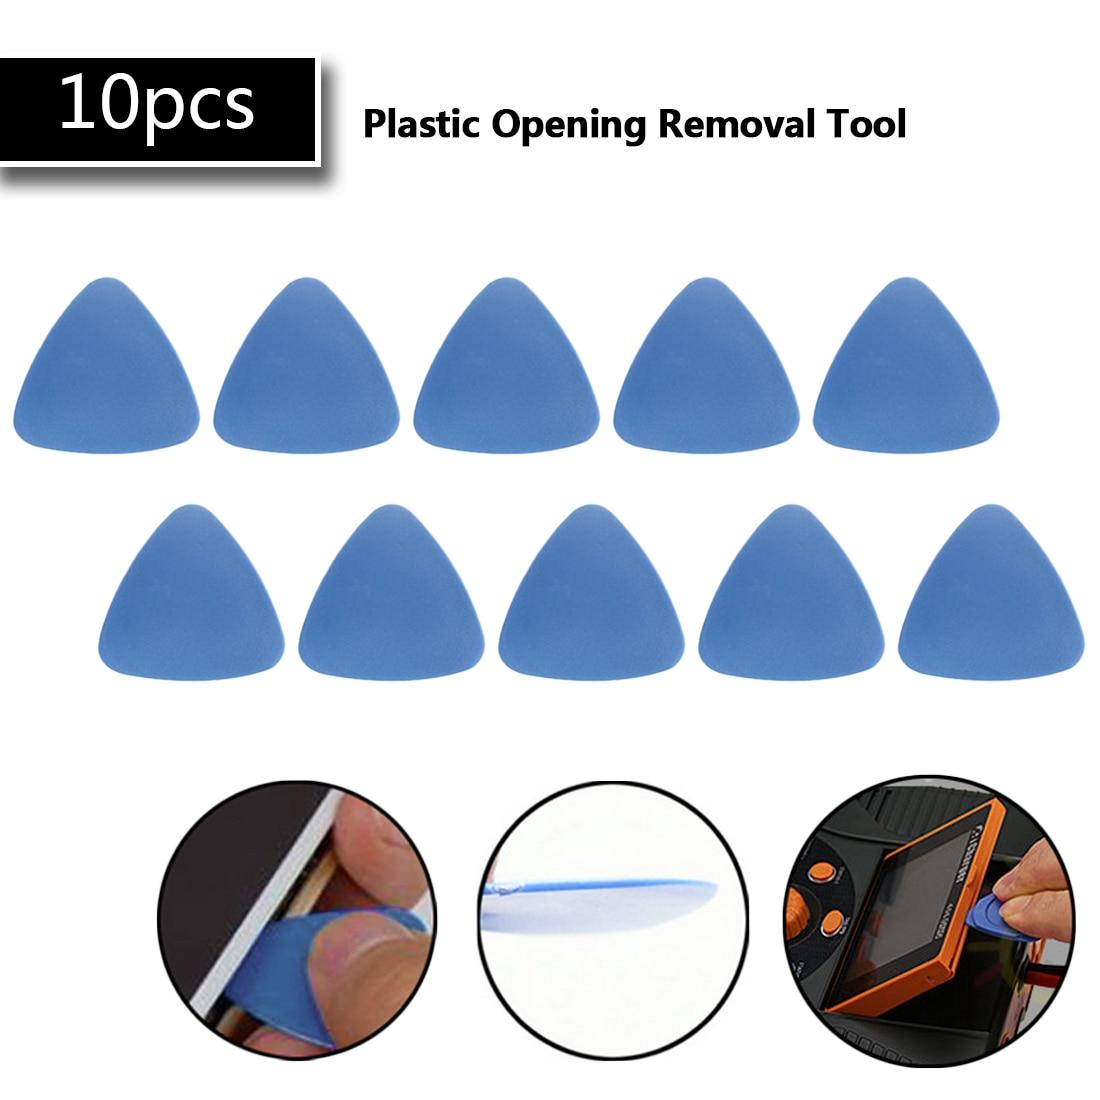 Opening Pry Disassemble Tool 10pcs Thin Triangle Repair Tools Kit For IPhone Tablet PC Laptop Repair /Guitar Pick DIY Hand Tools